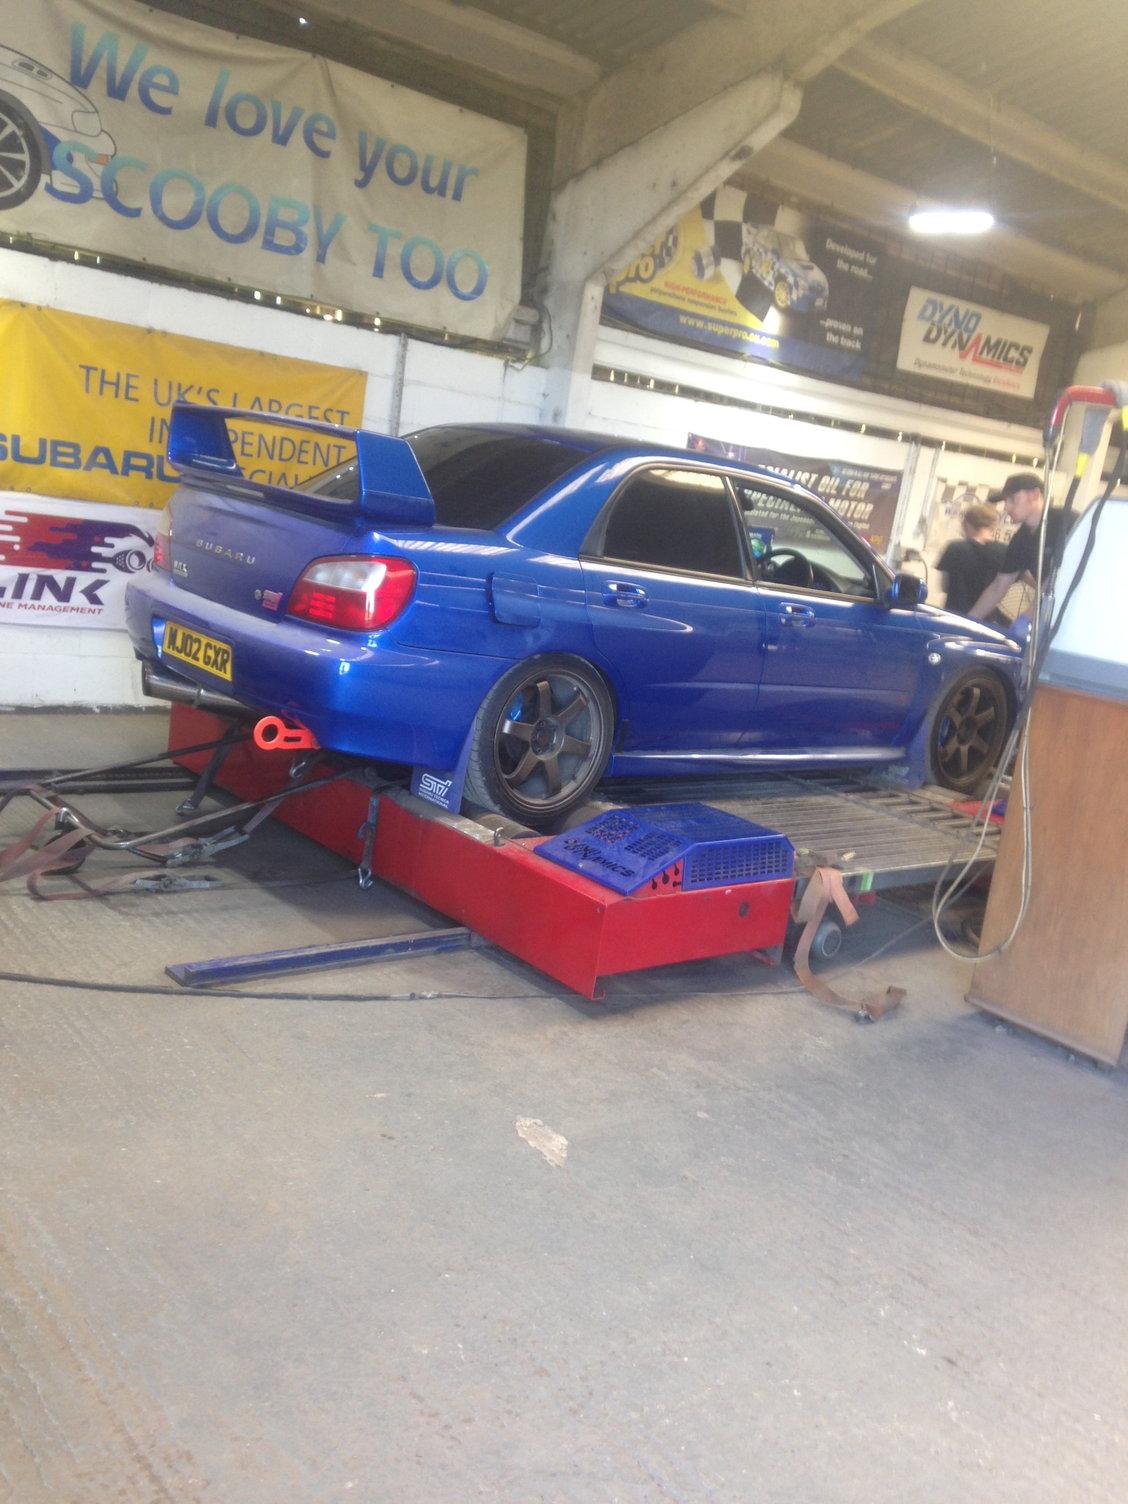 Subaru wrx sti Prodrive style - ScoobyNet com - Subaru